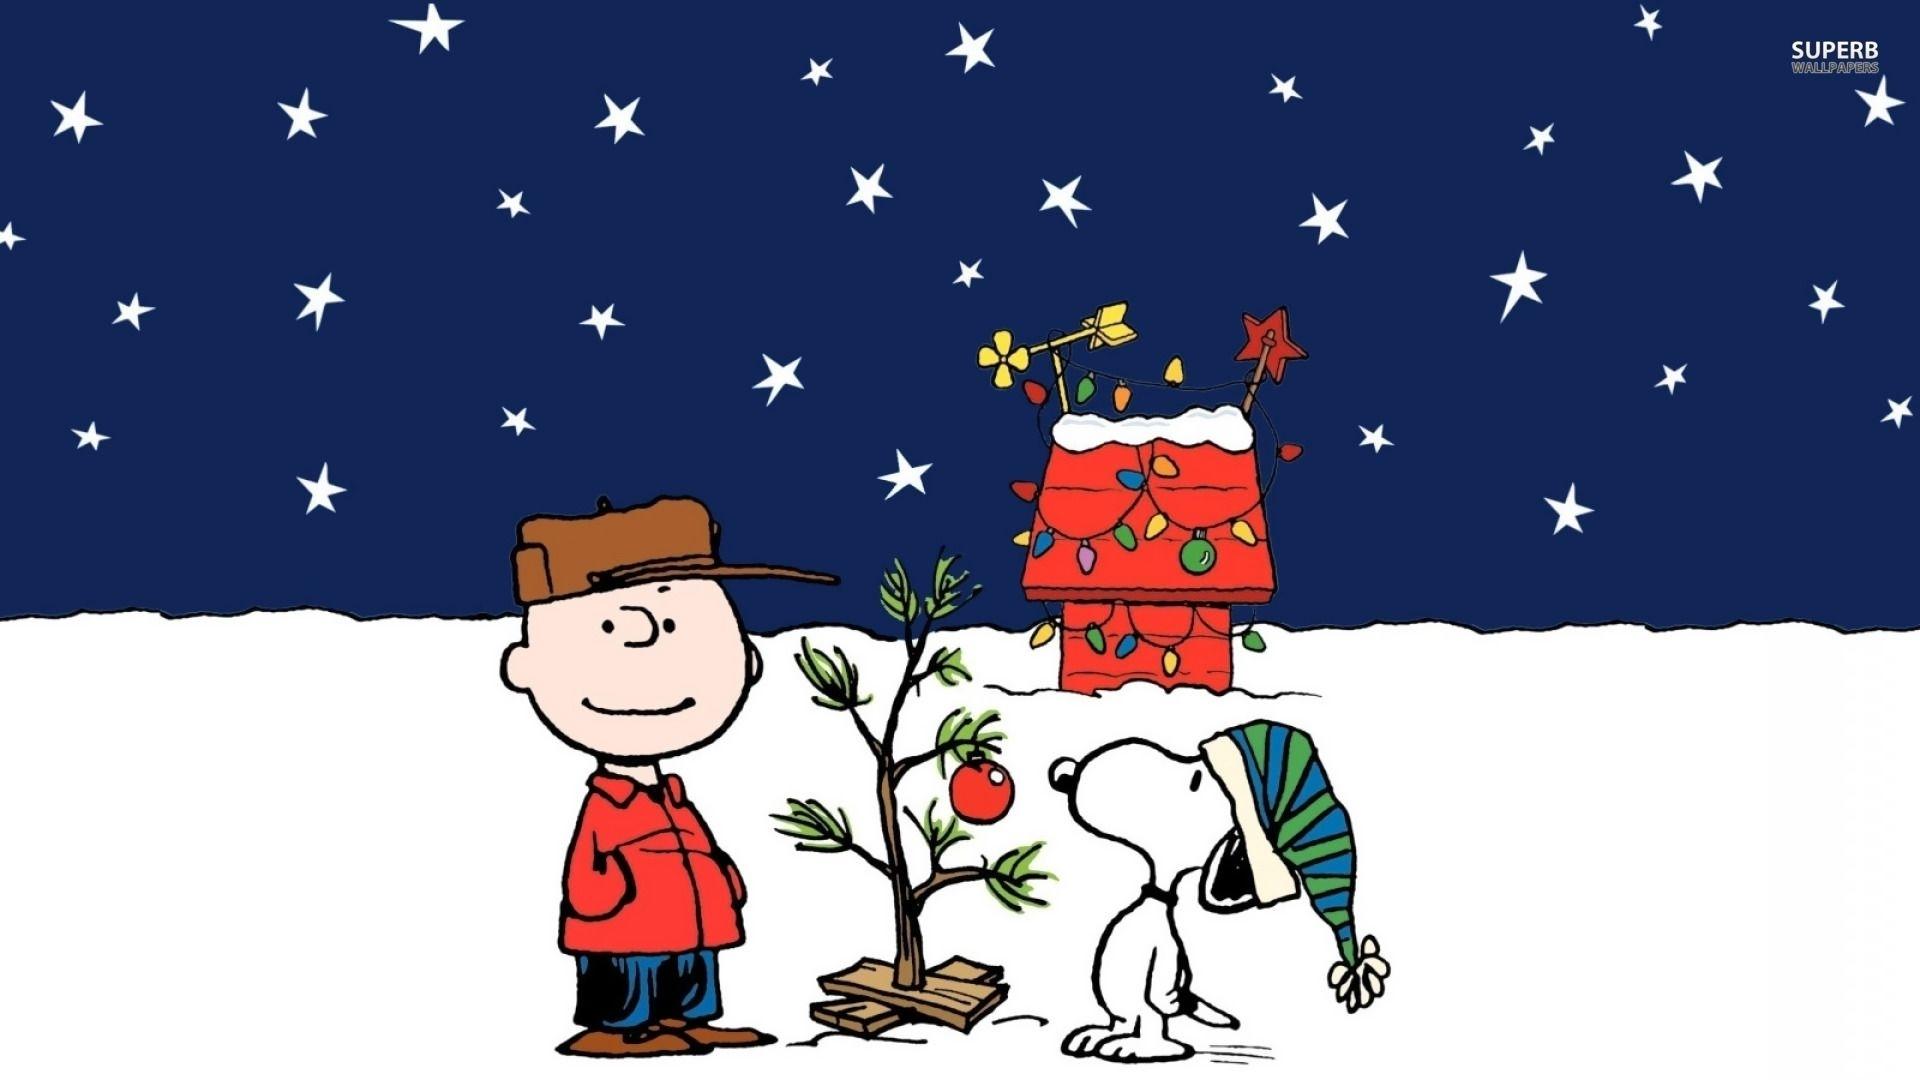 charlie brown christmas tree wallpapers group (56+)